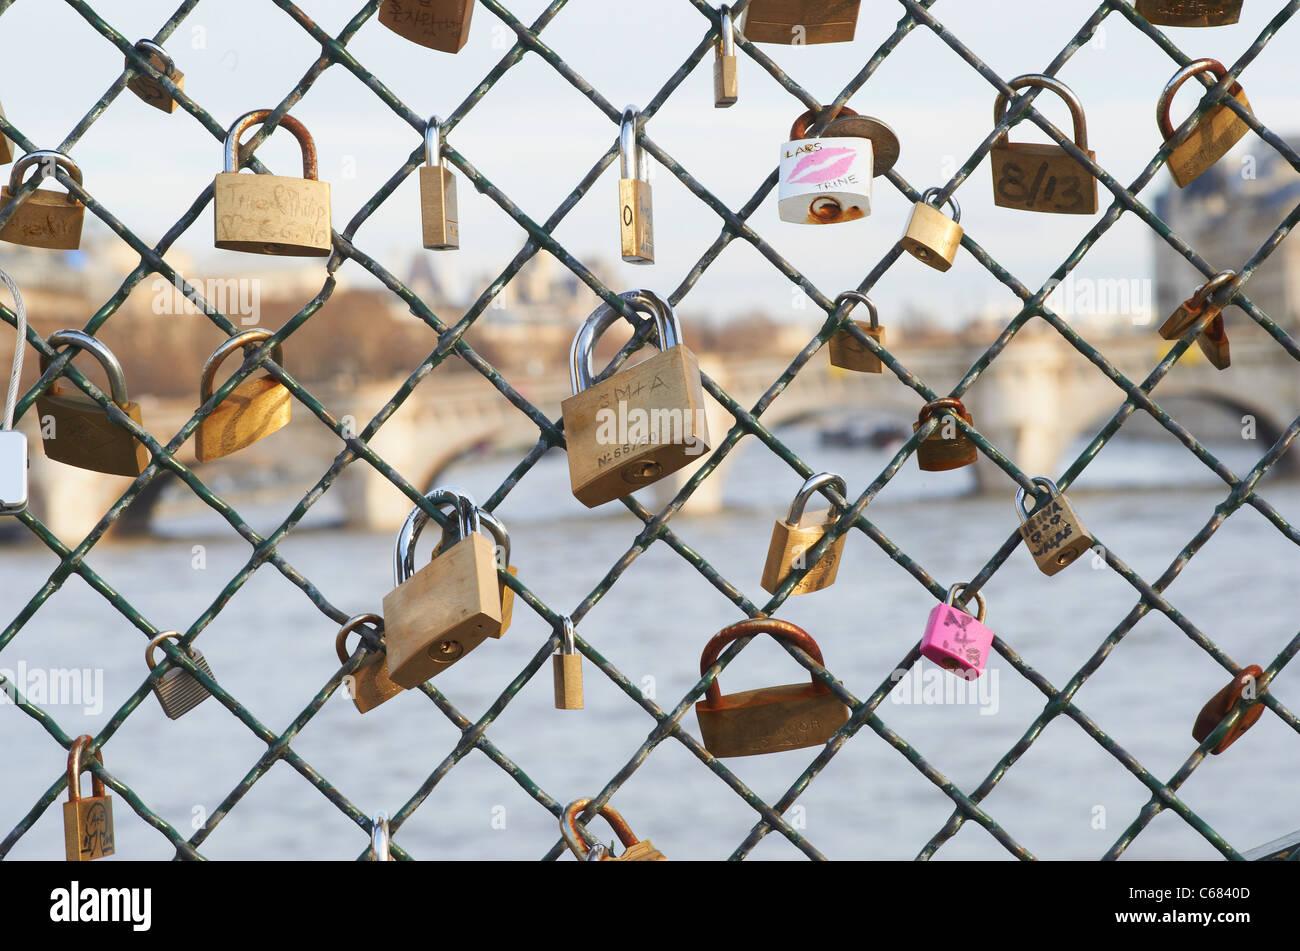 Padlocks on chain link fence - Stock Image